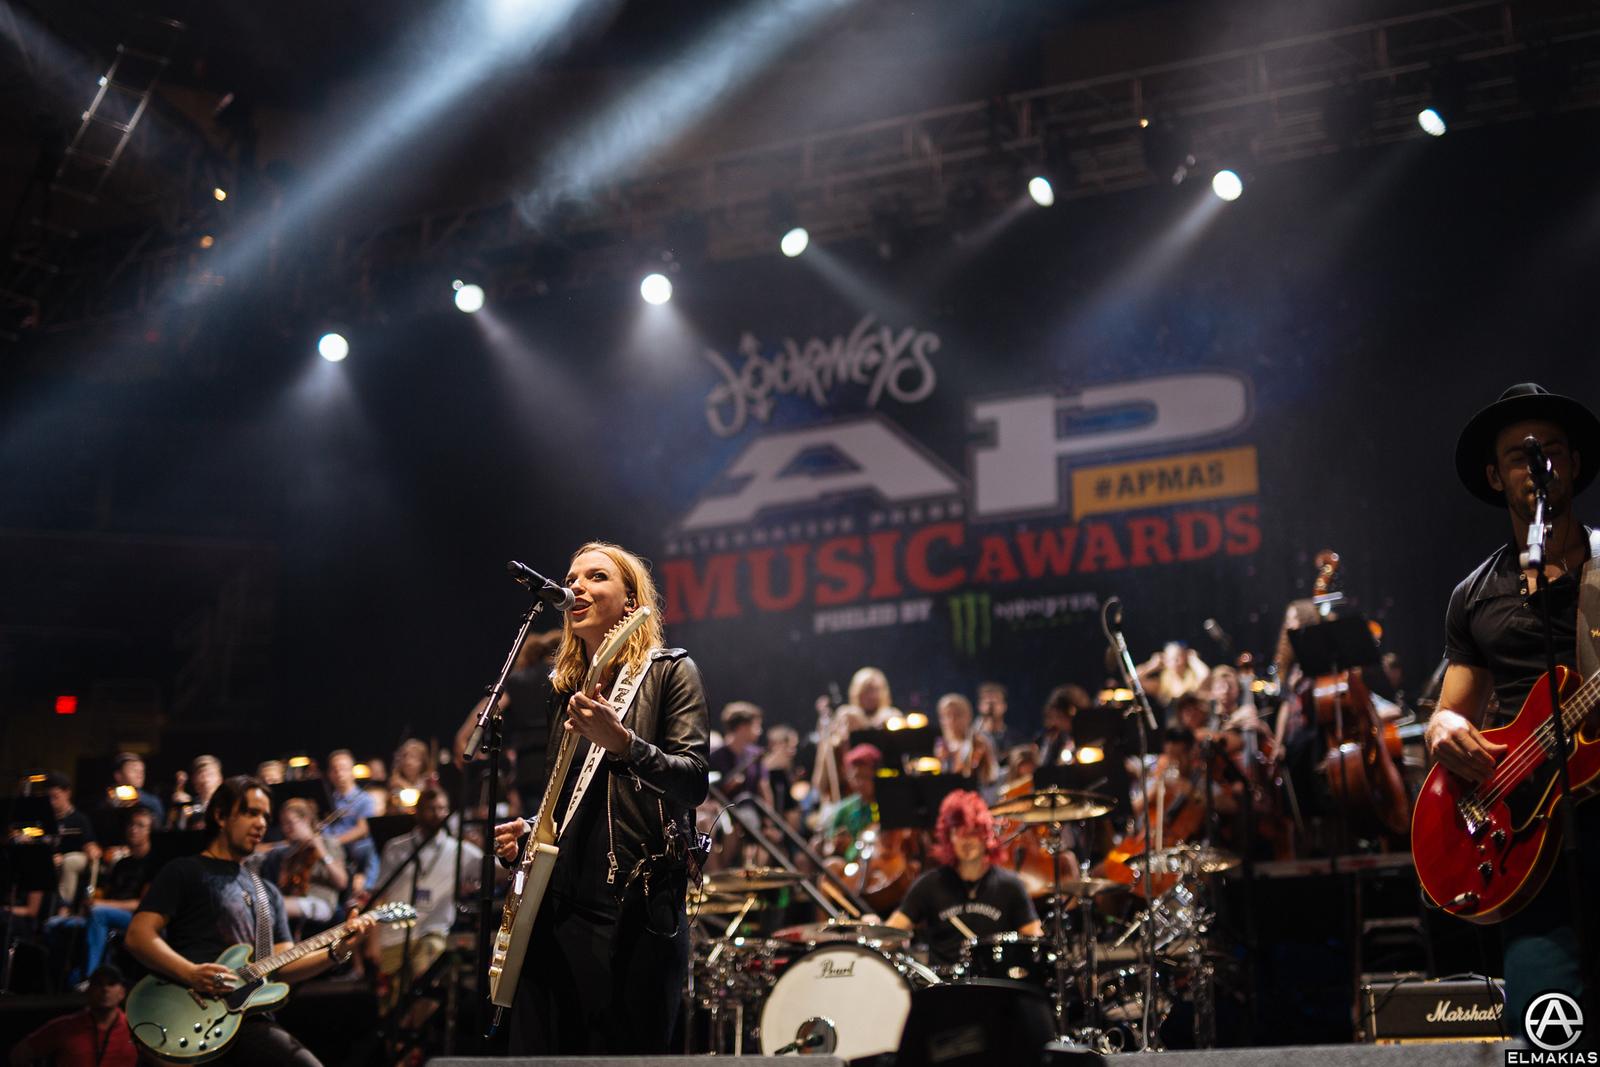 Halestorm at rehearsals for the Alternative Press Music Awards 2015 by Adam Elmakias